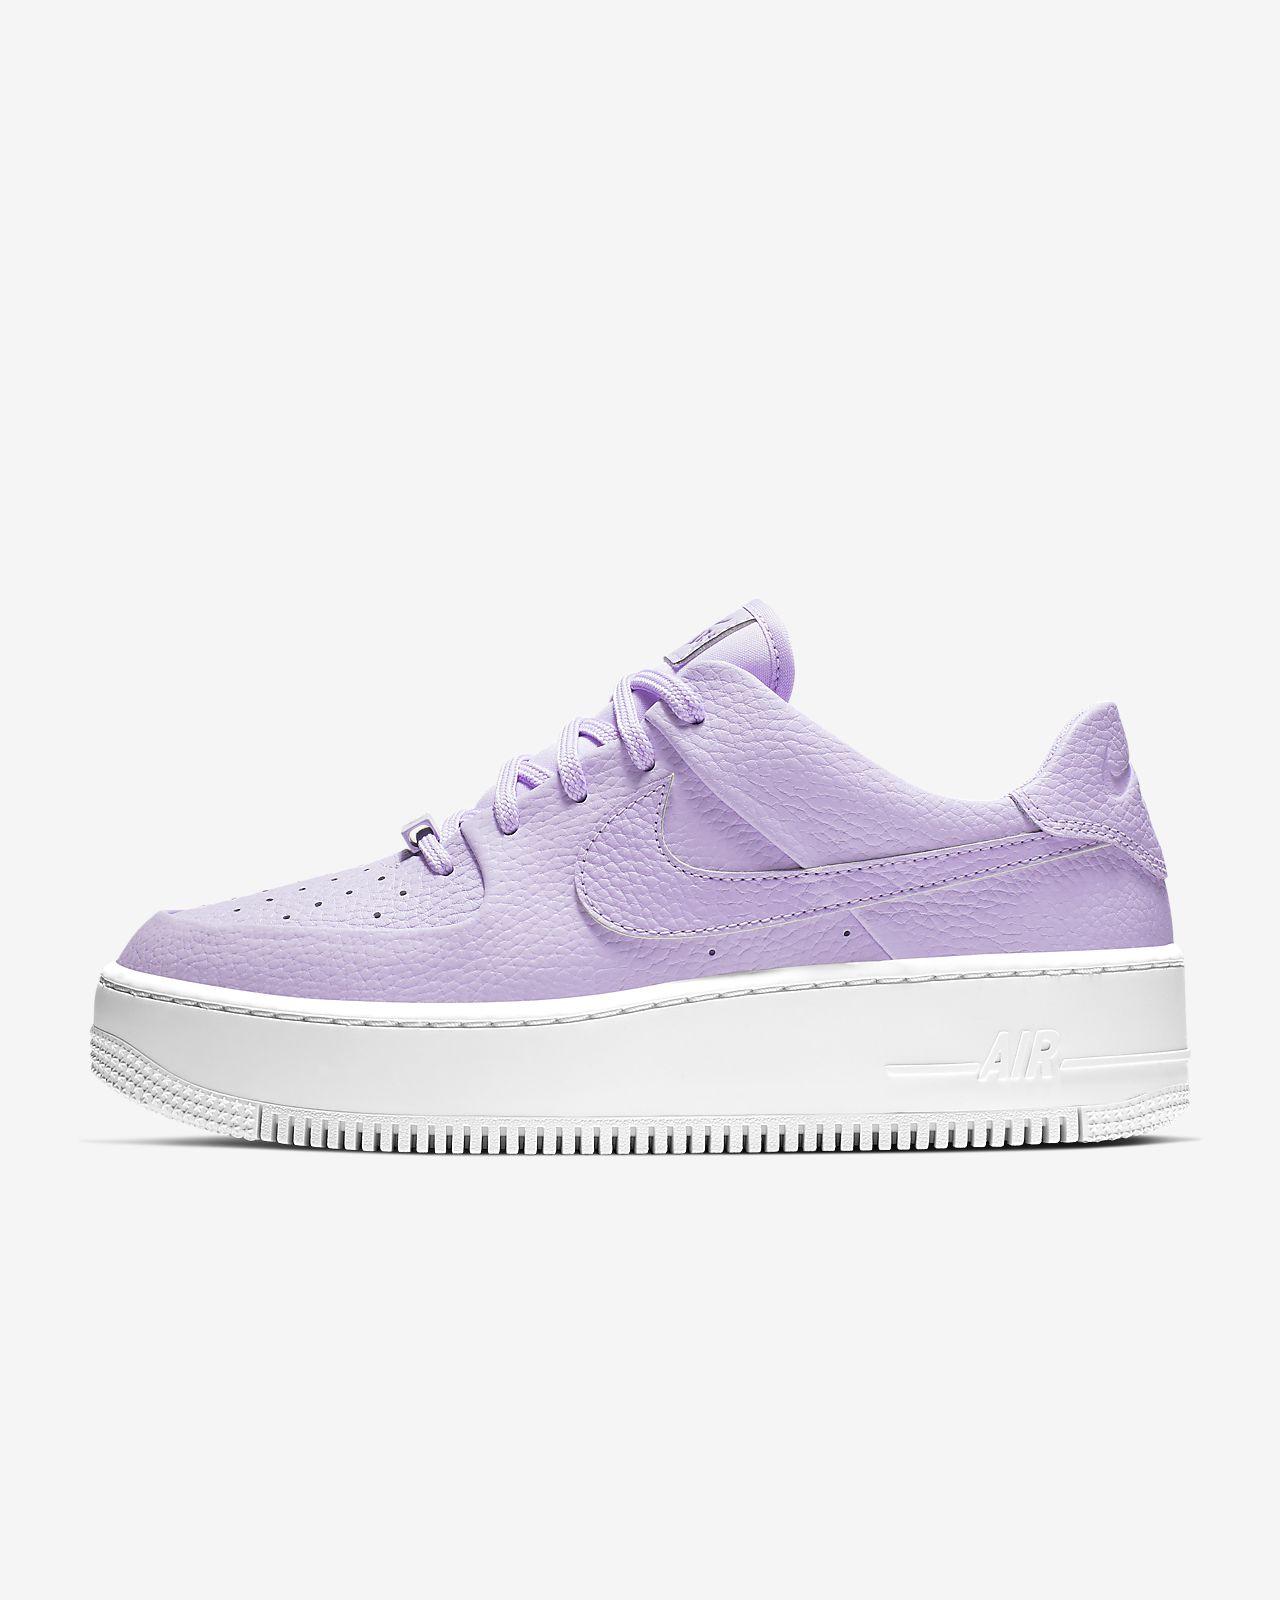 0a361050c Dámská bota Nike Air Force 1 Sage Low. Nike.com CZ